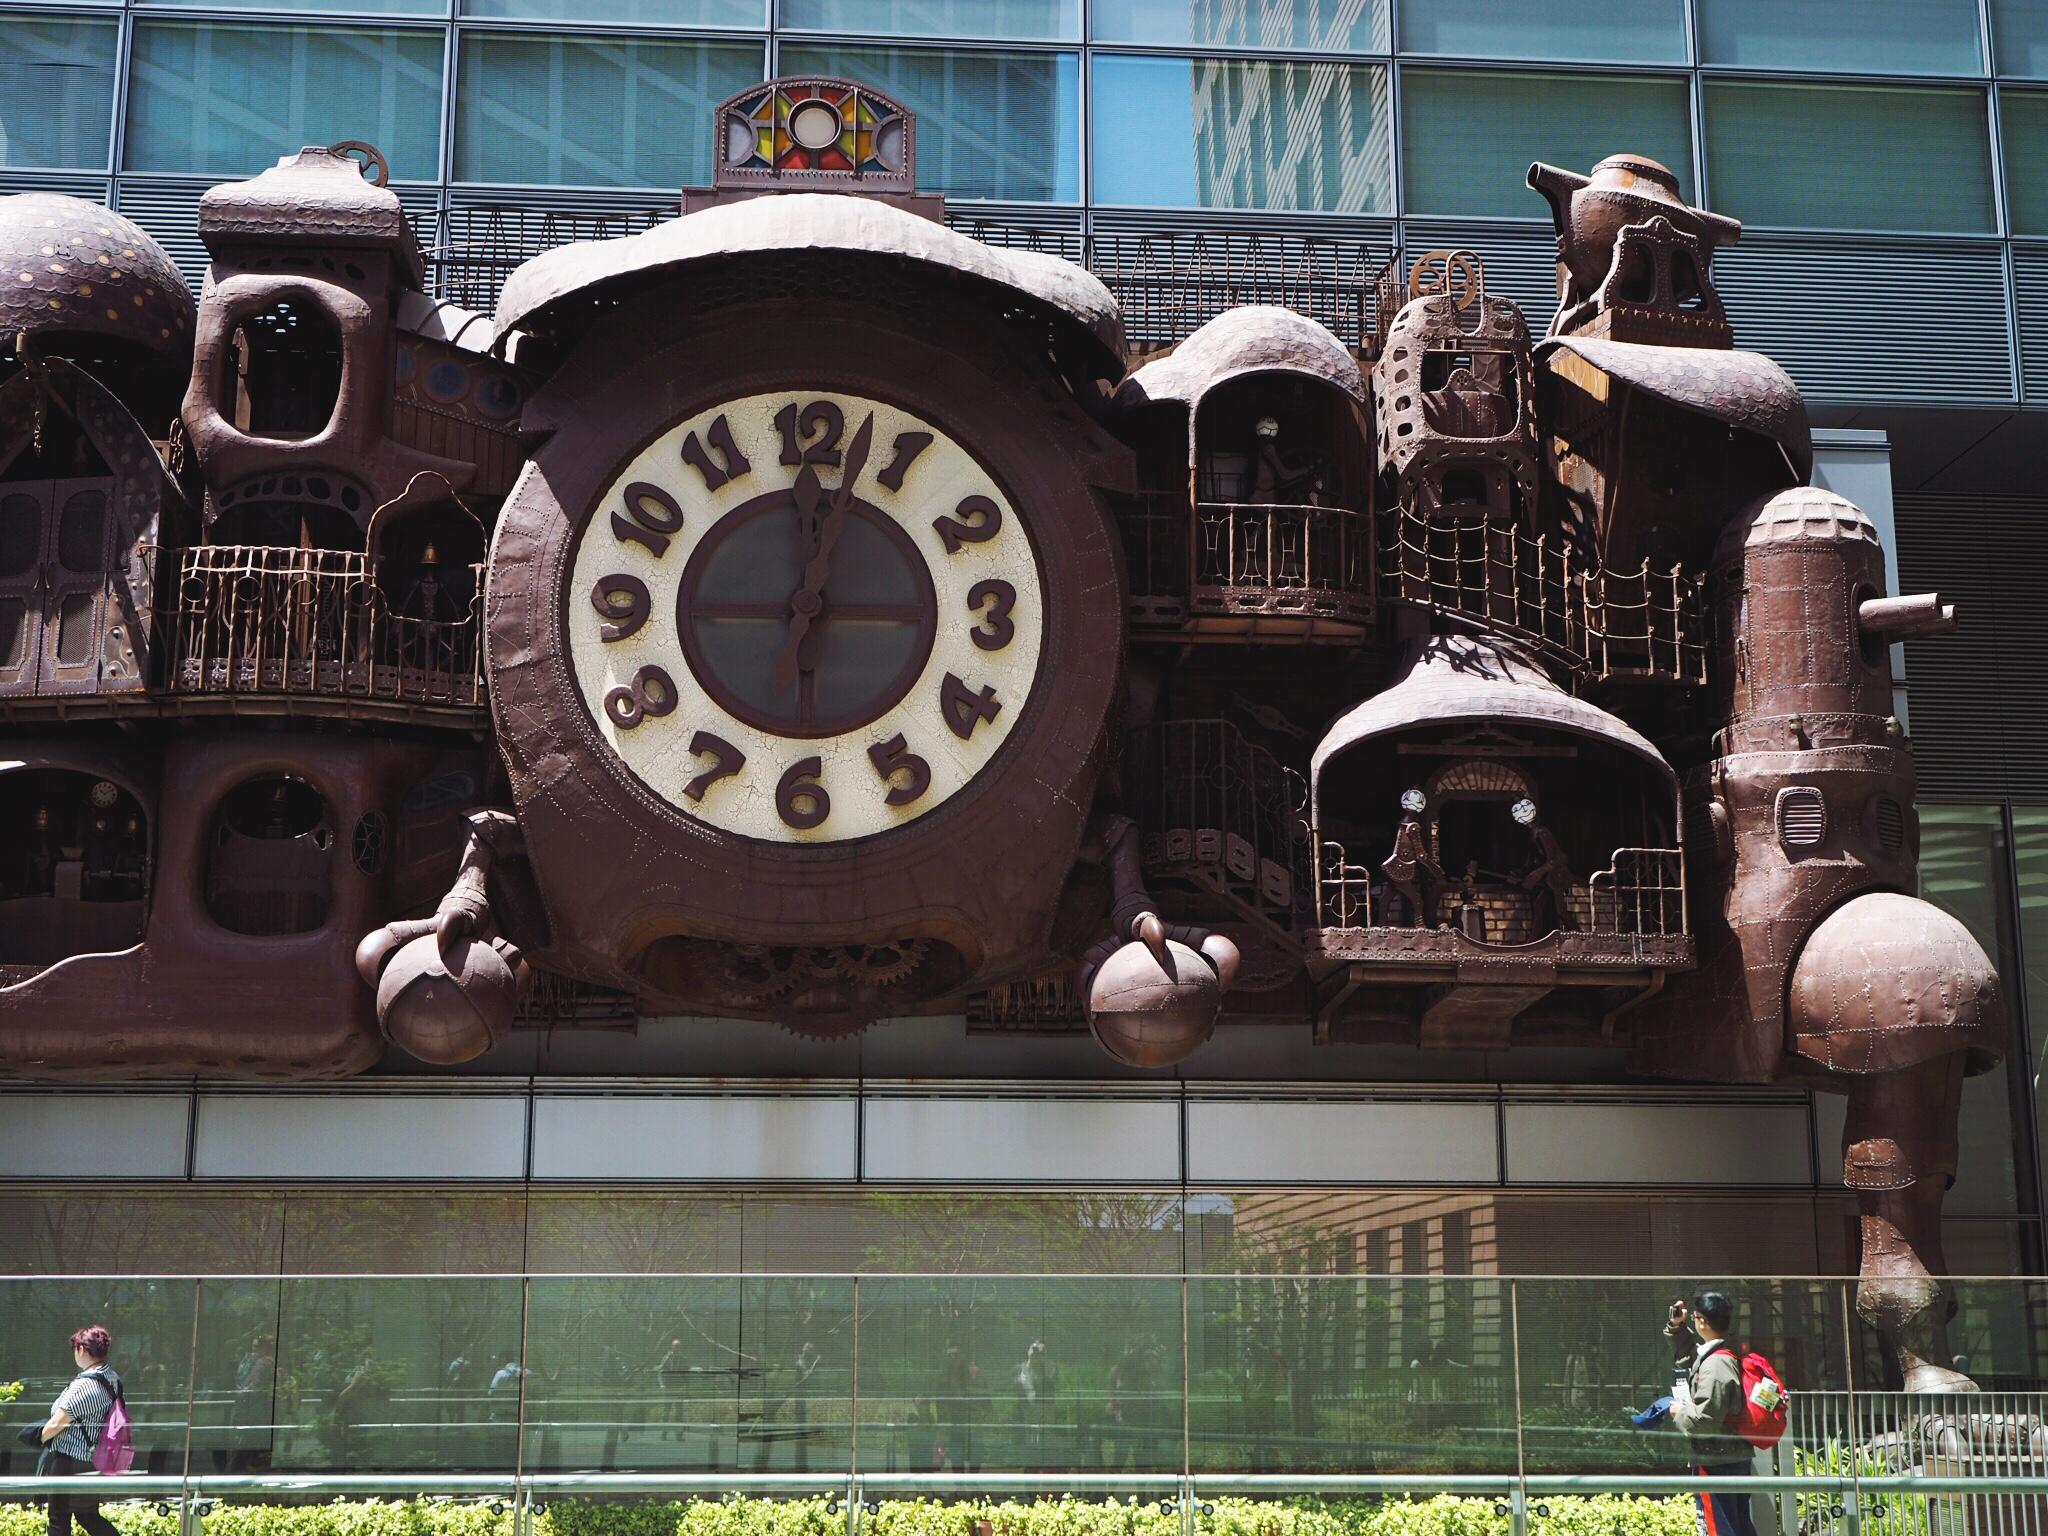 Miyazaki Clock in front of the NTV building